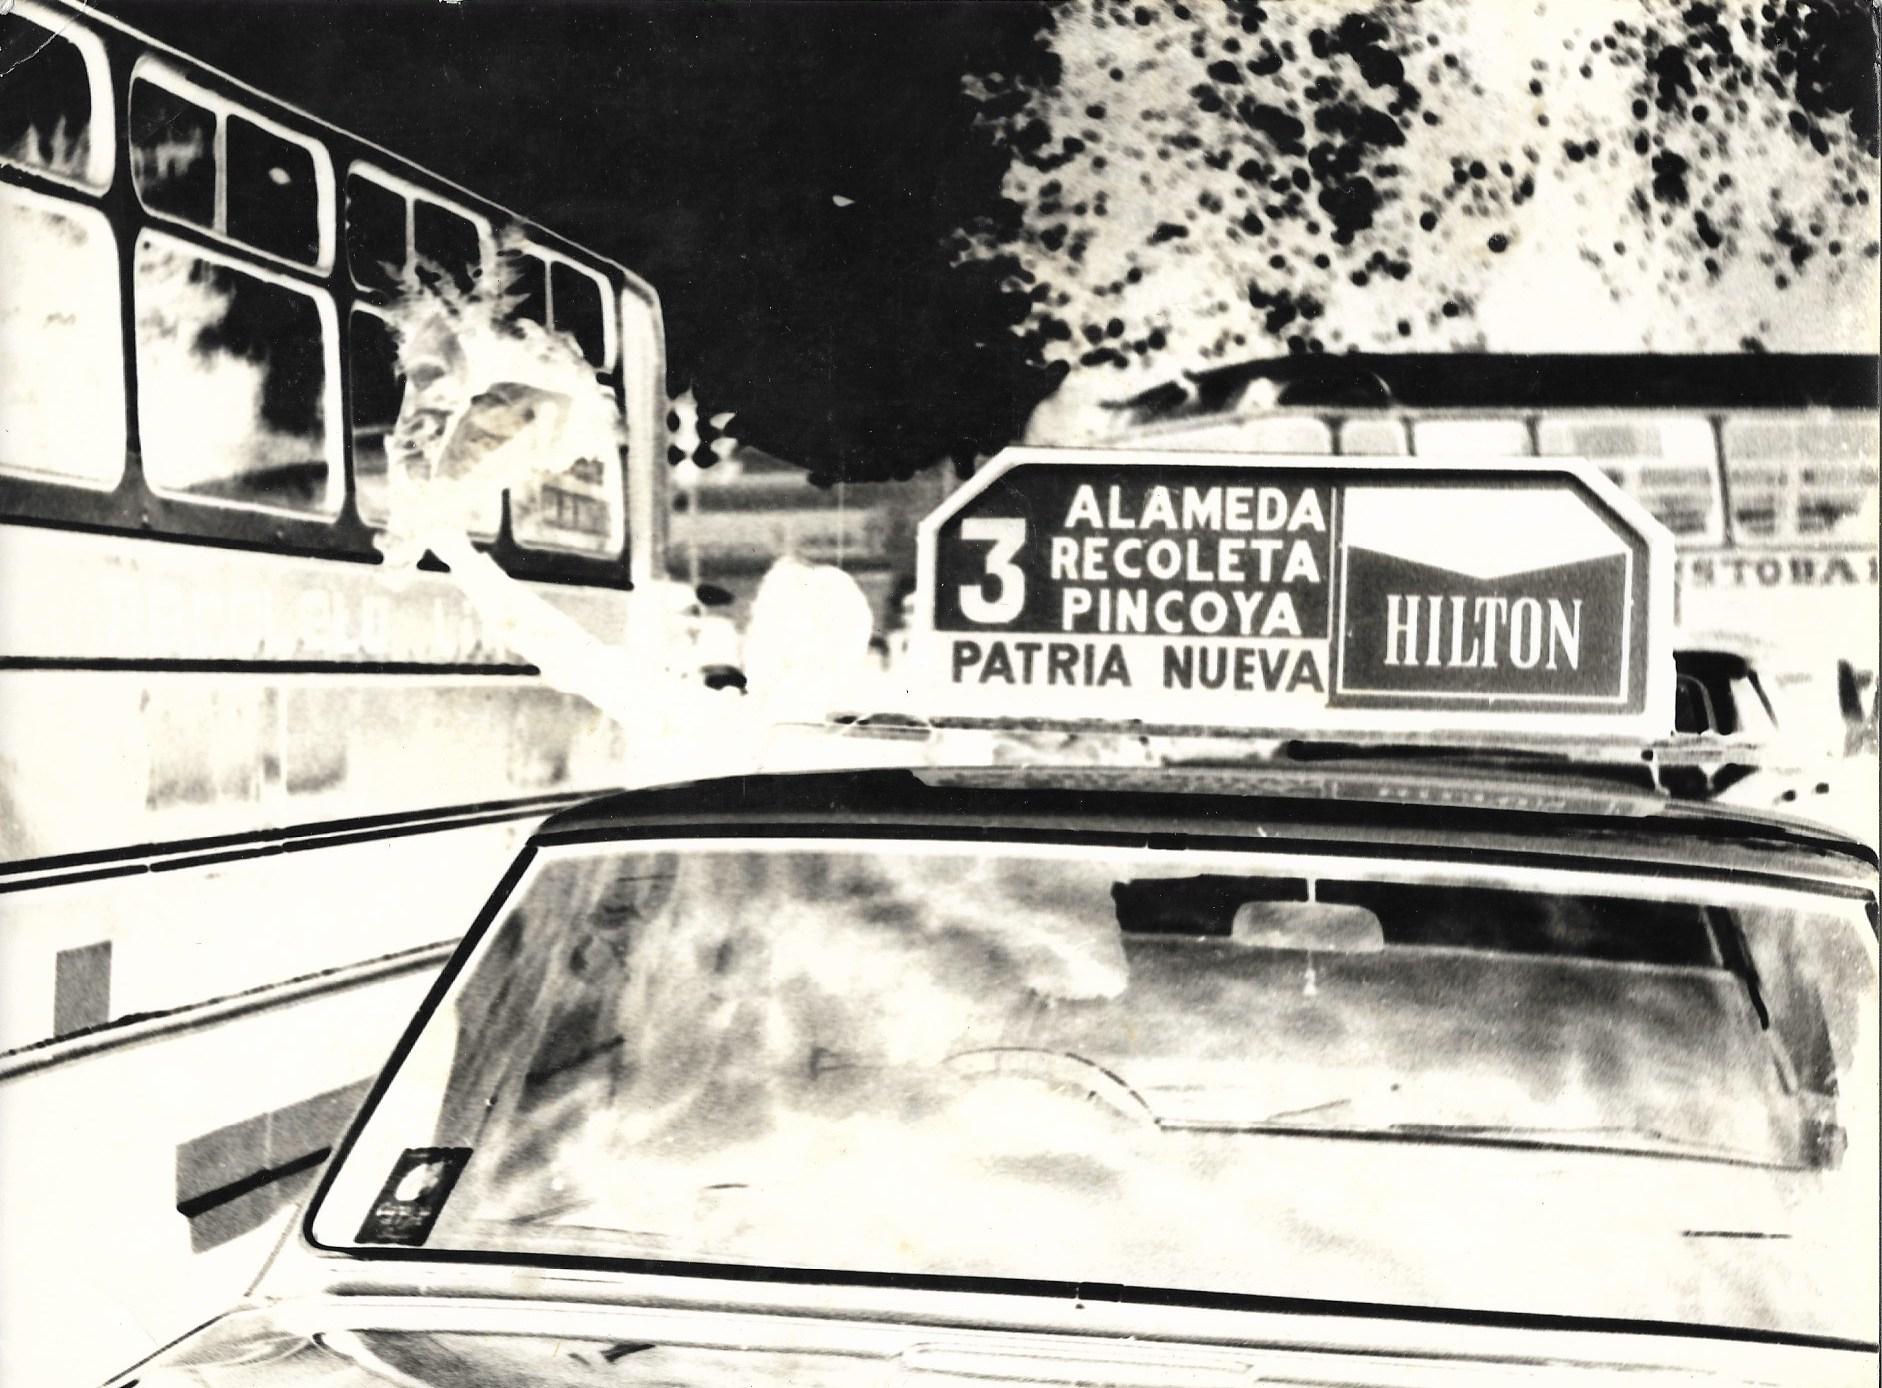 <span>'Alameda, Recoleta, Pincoya', Santiago</span>